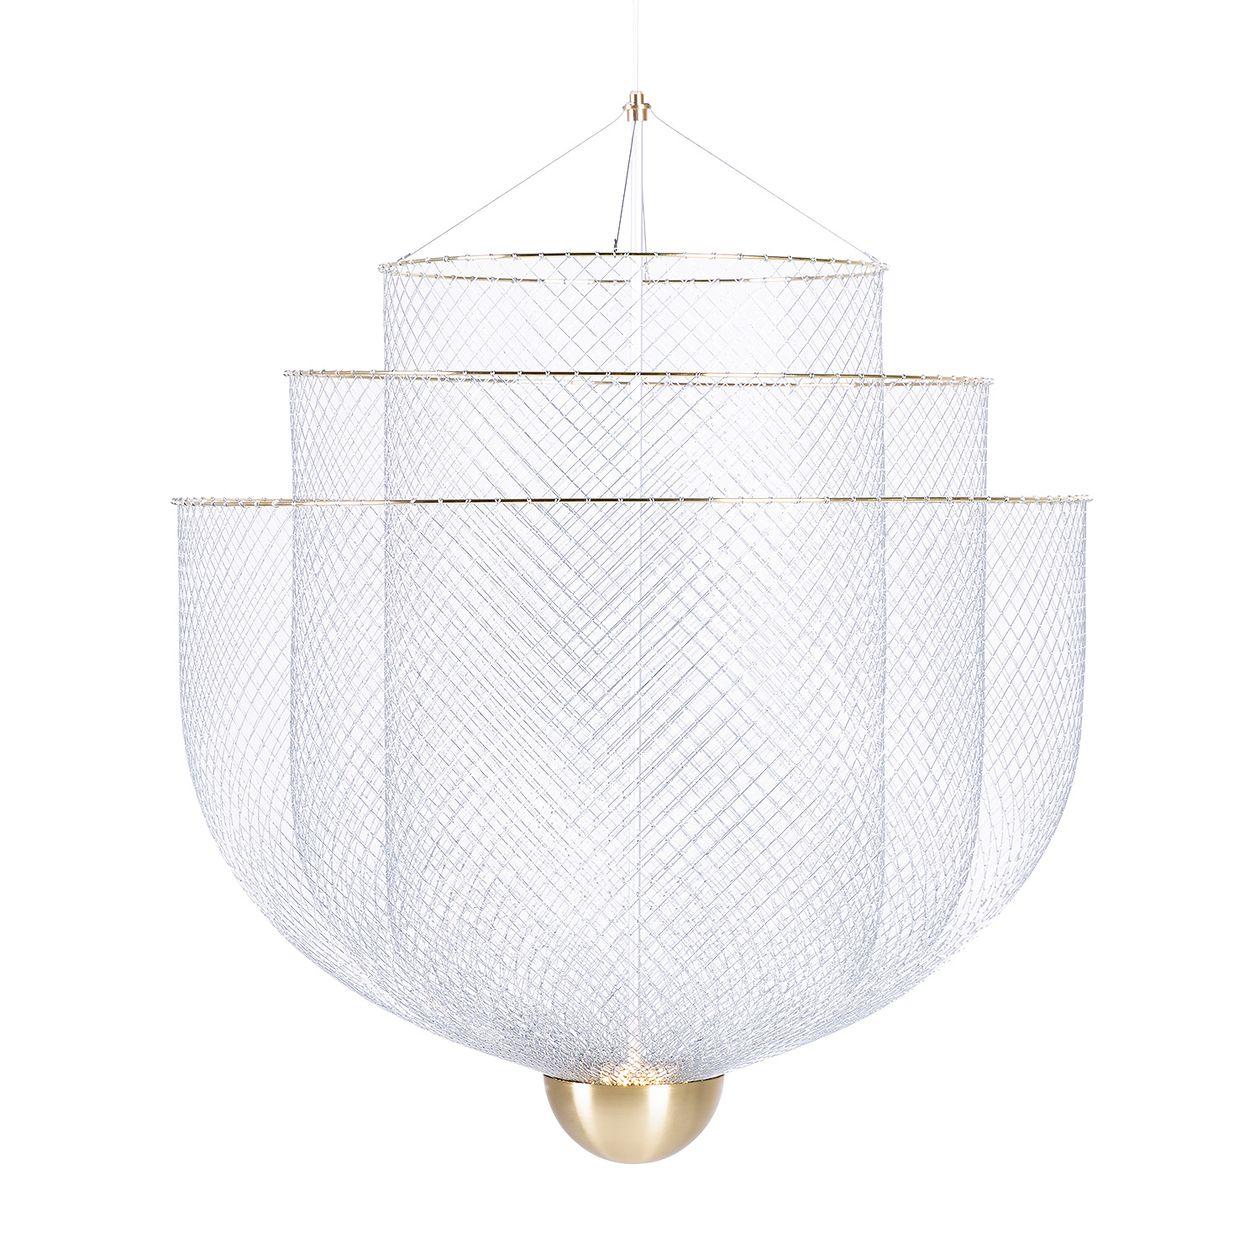 Moooi:Meshmatics chandelier